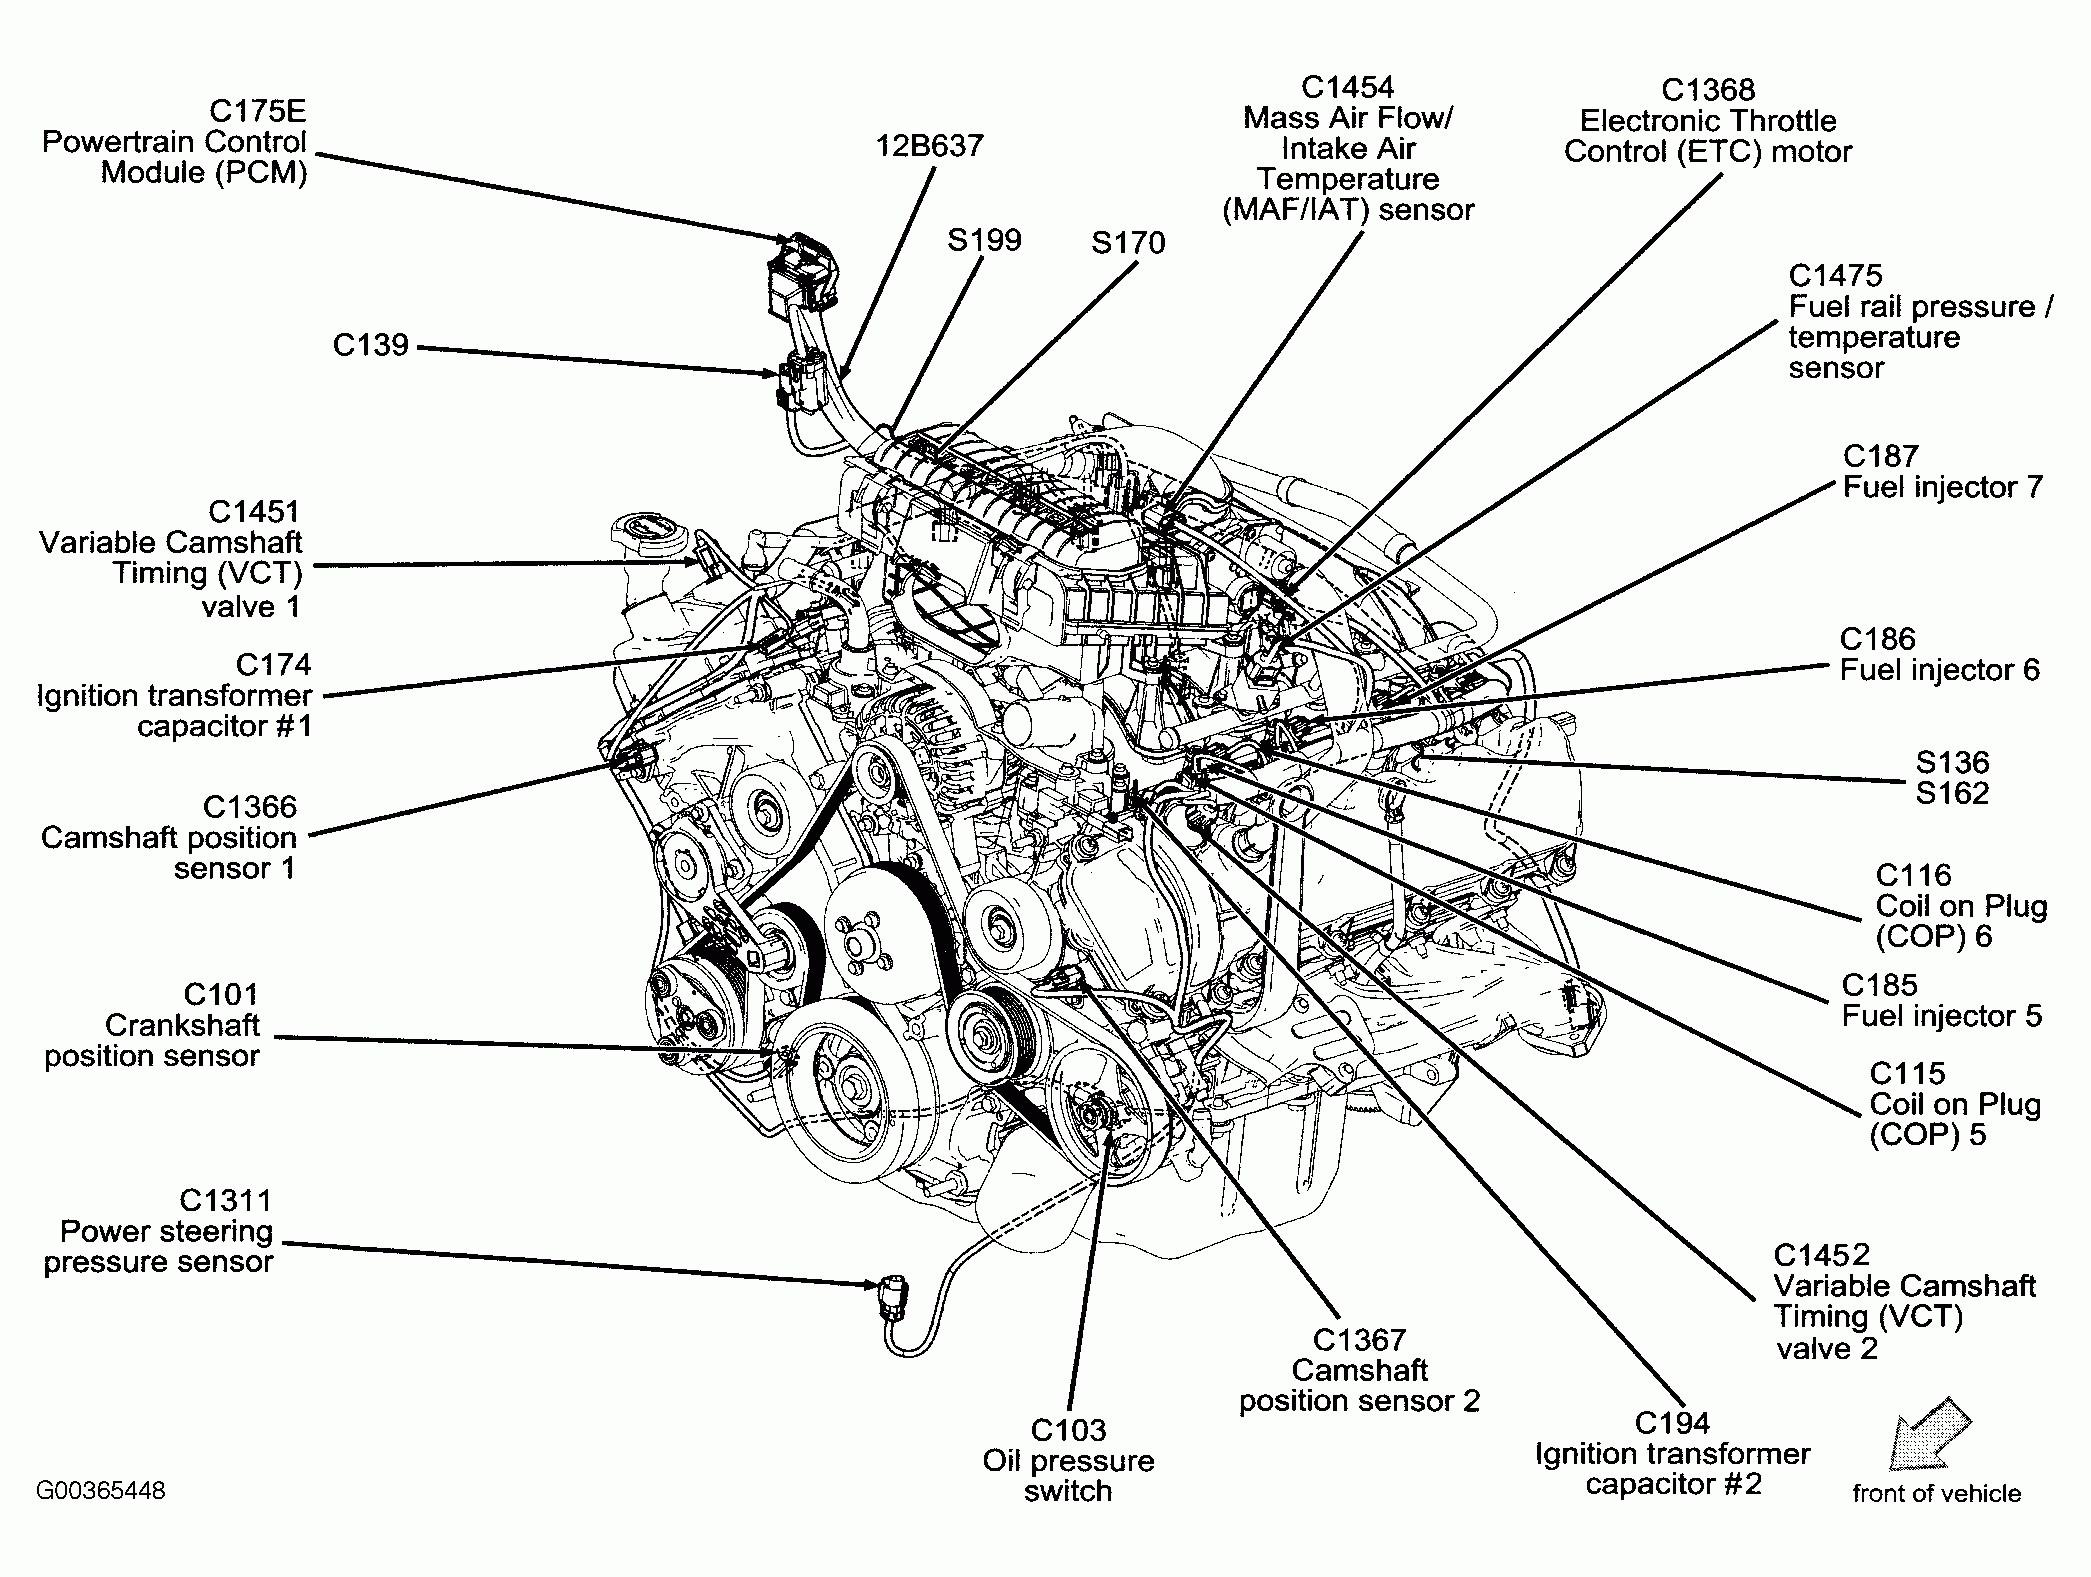 1999 ford Explorer Engine Diagram 1999 ford 4 6 Engine Diagram Wiring Diagram Datasource Of 1999 ford Explorer Engine Diagram